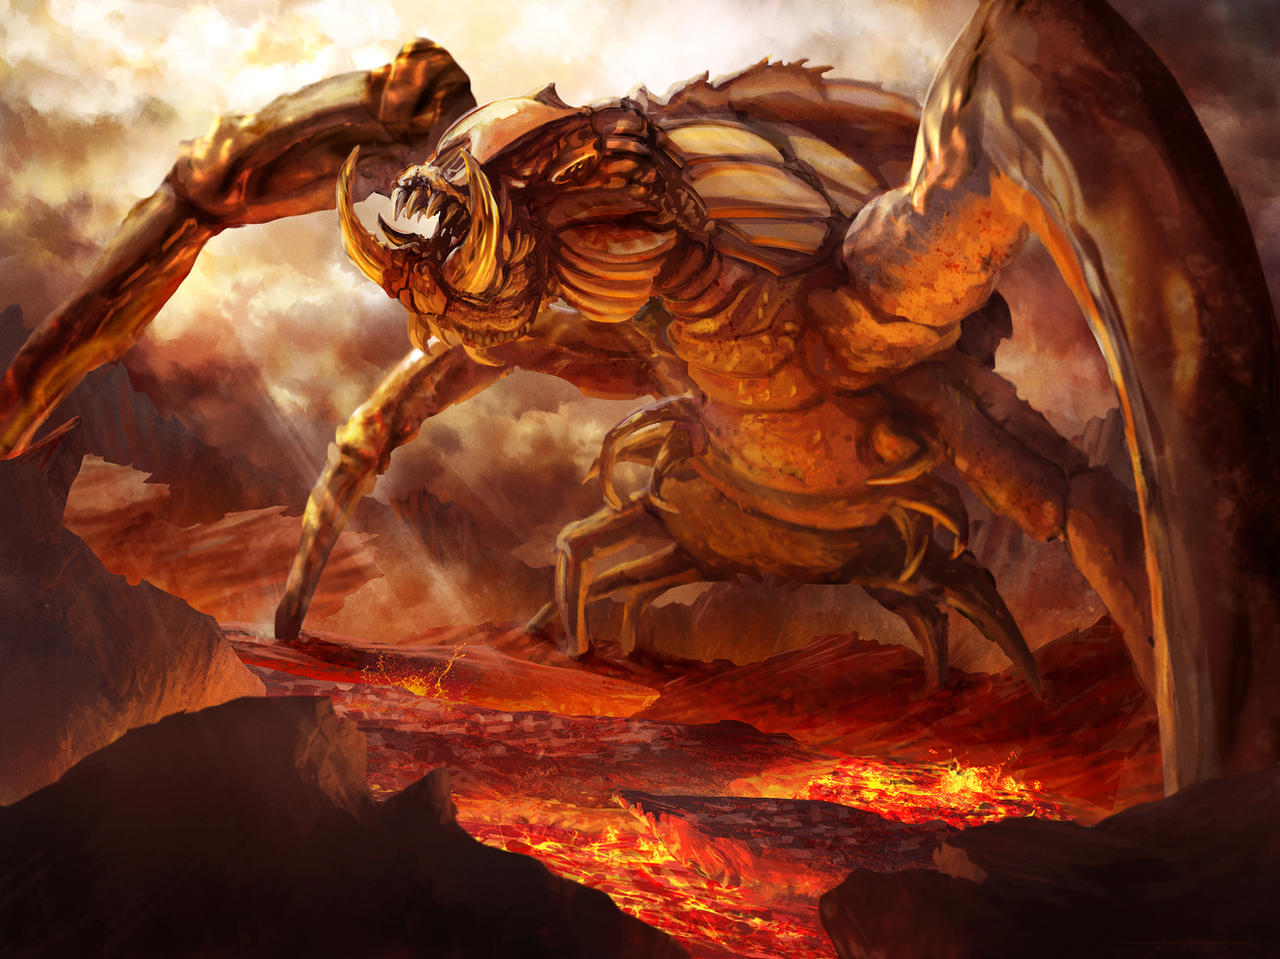 Furnace Wasp by JoshCalloway